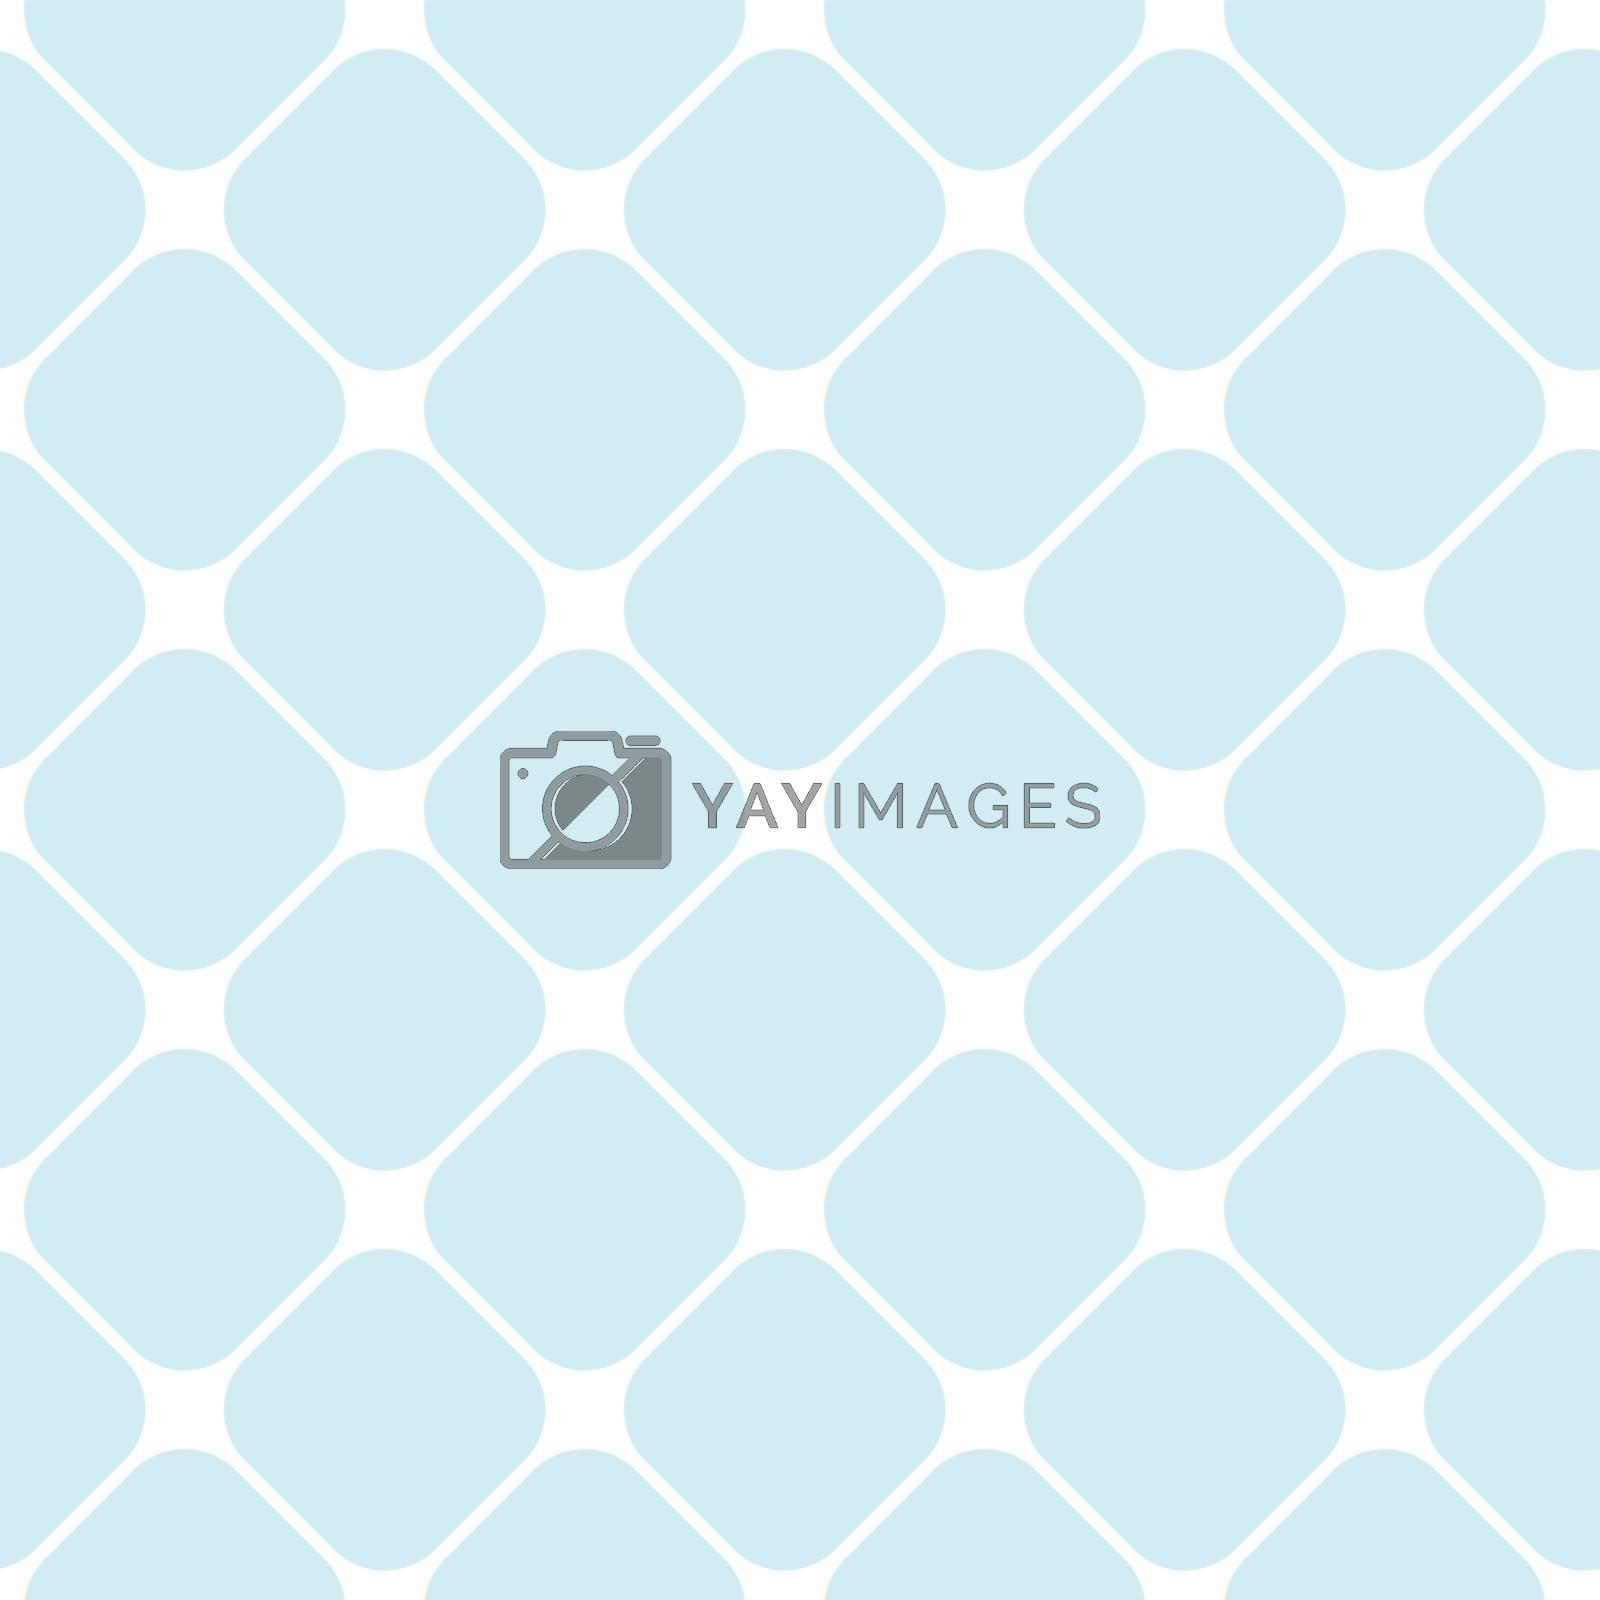 Seamless simple diagonal square by Zebra-Finch